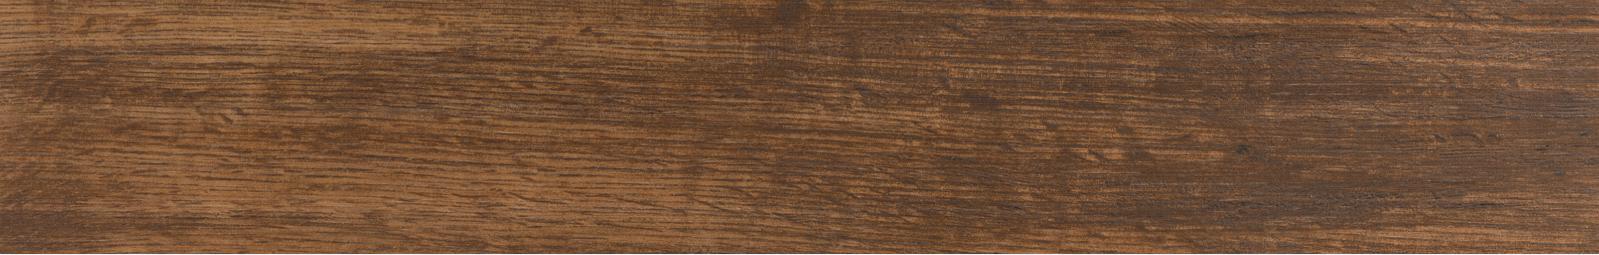 Напольная плитка Venis Hampton +14156 Brown напольная плитка cersanit horn nero 32 6х32 6